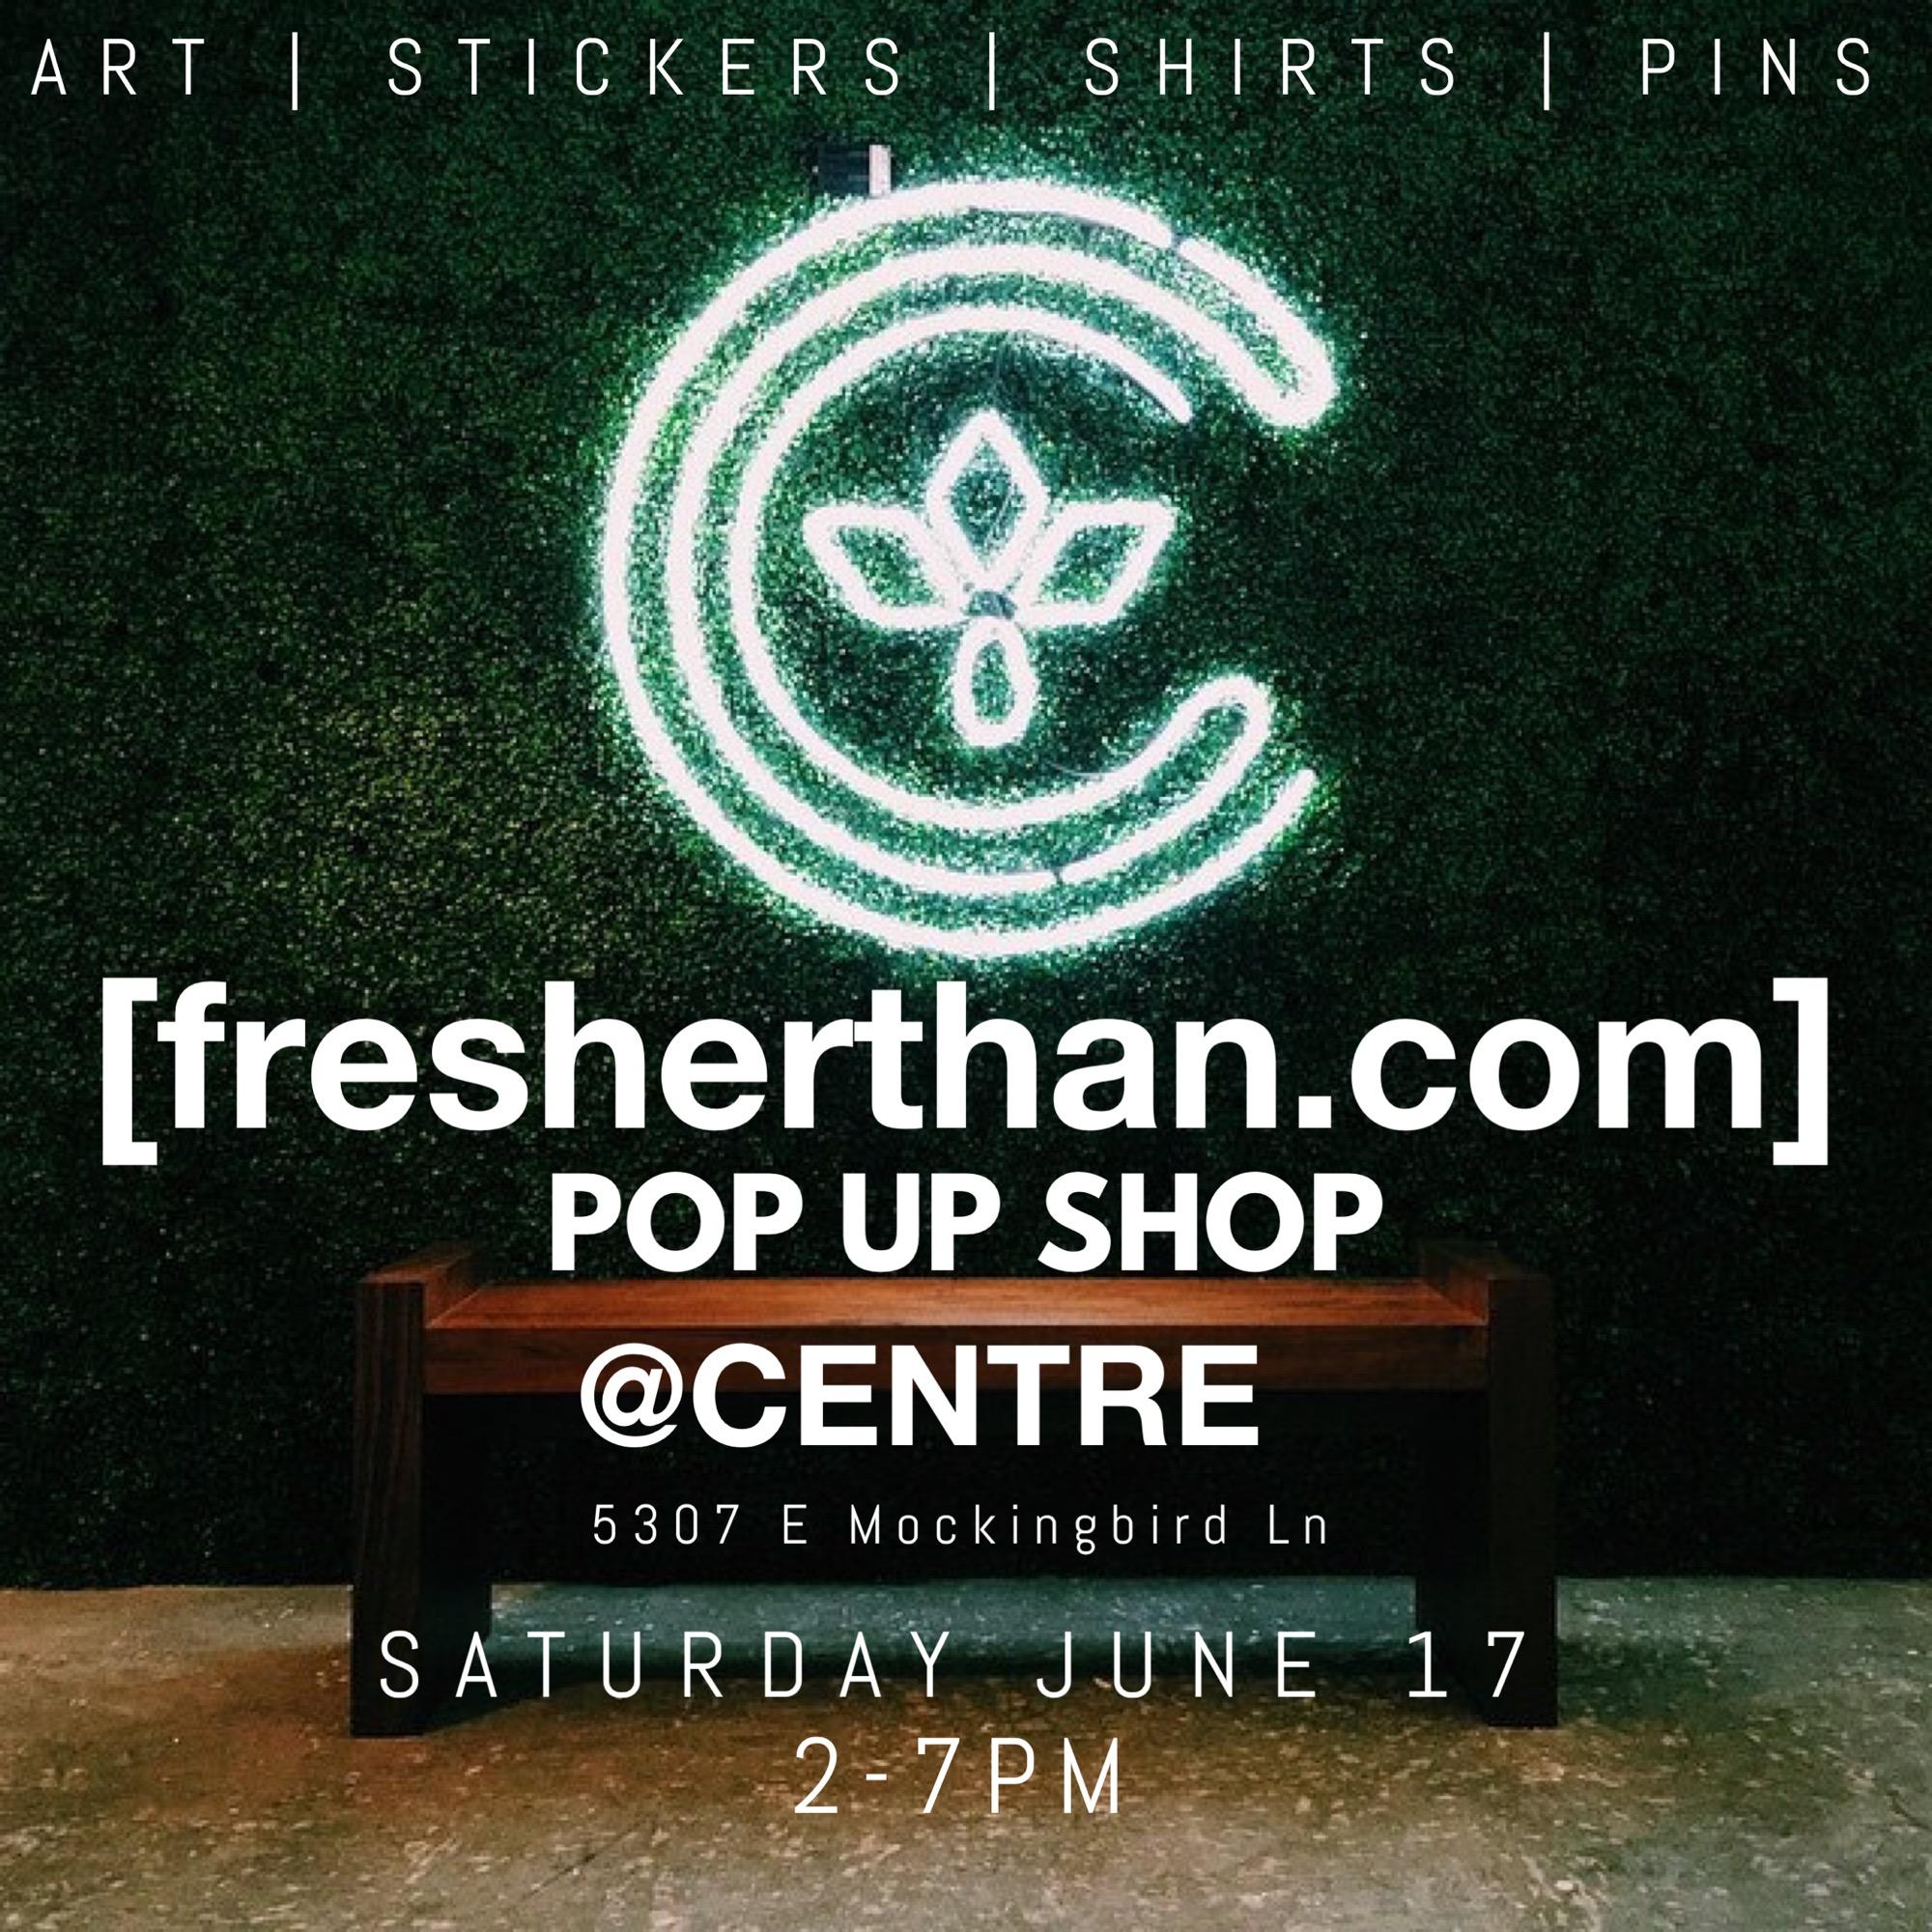 fresherthan-centre-pop-up.jpg